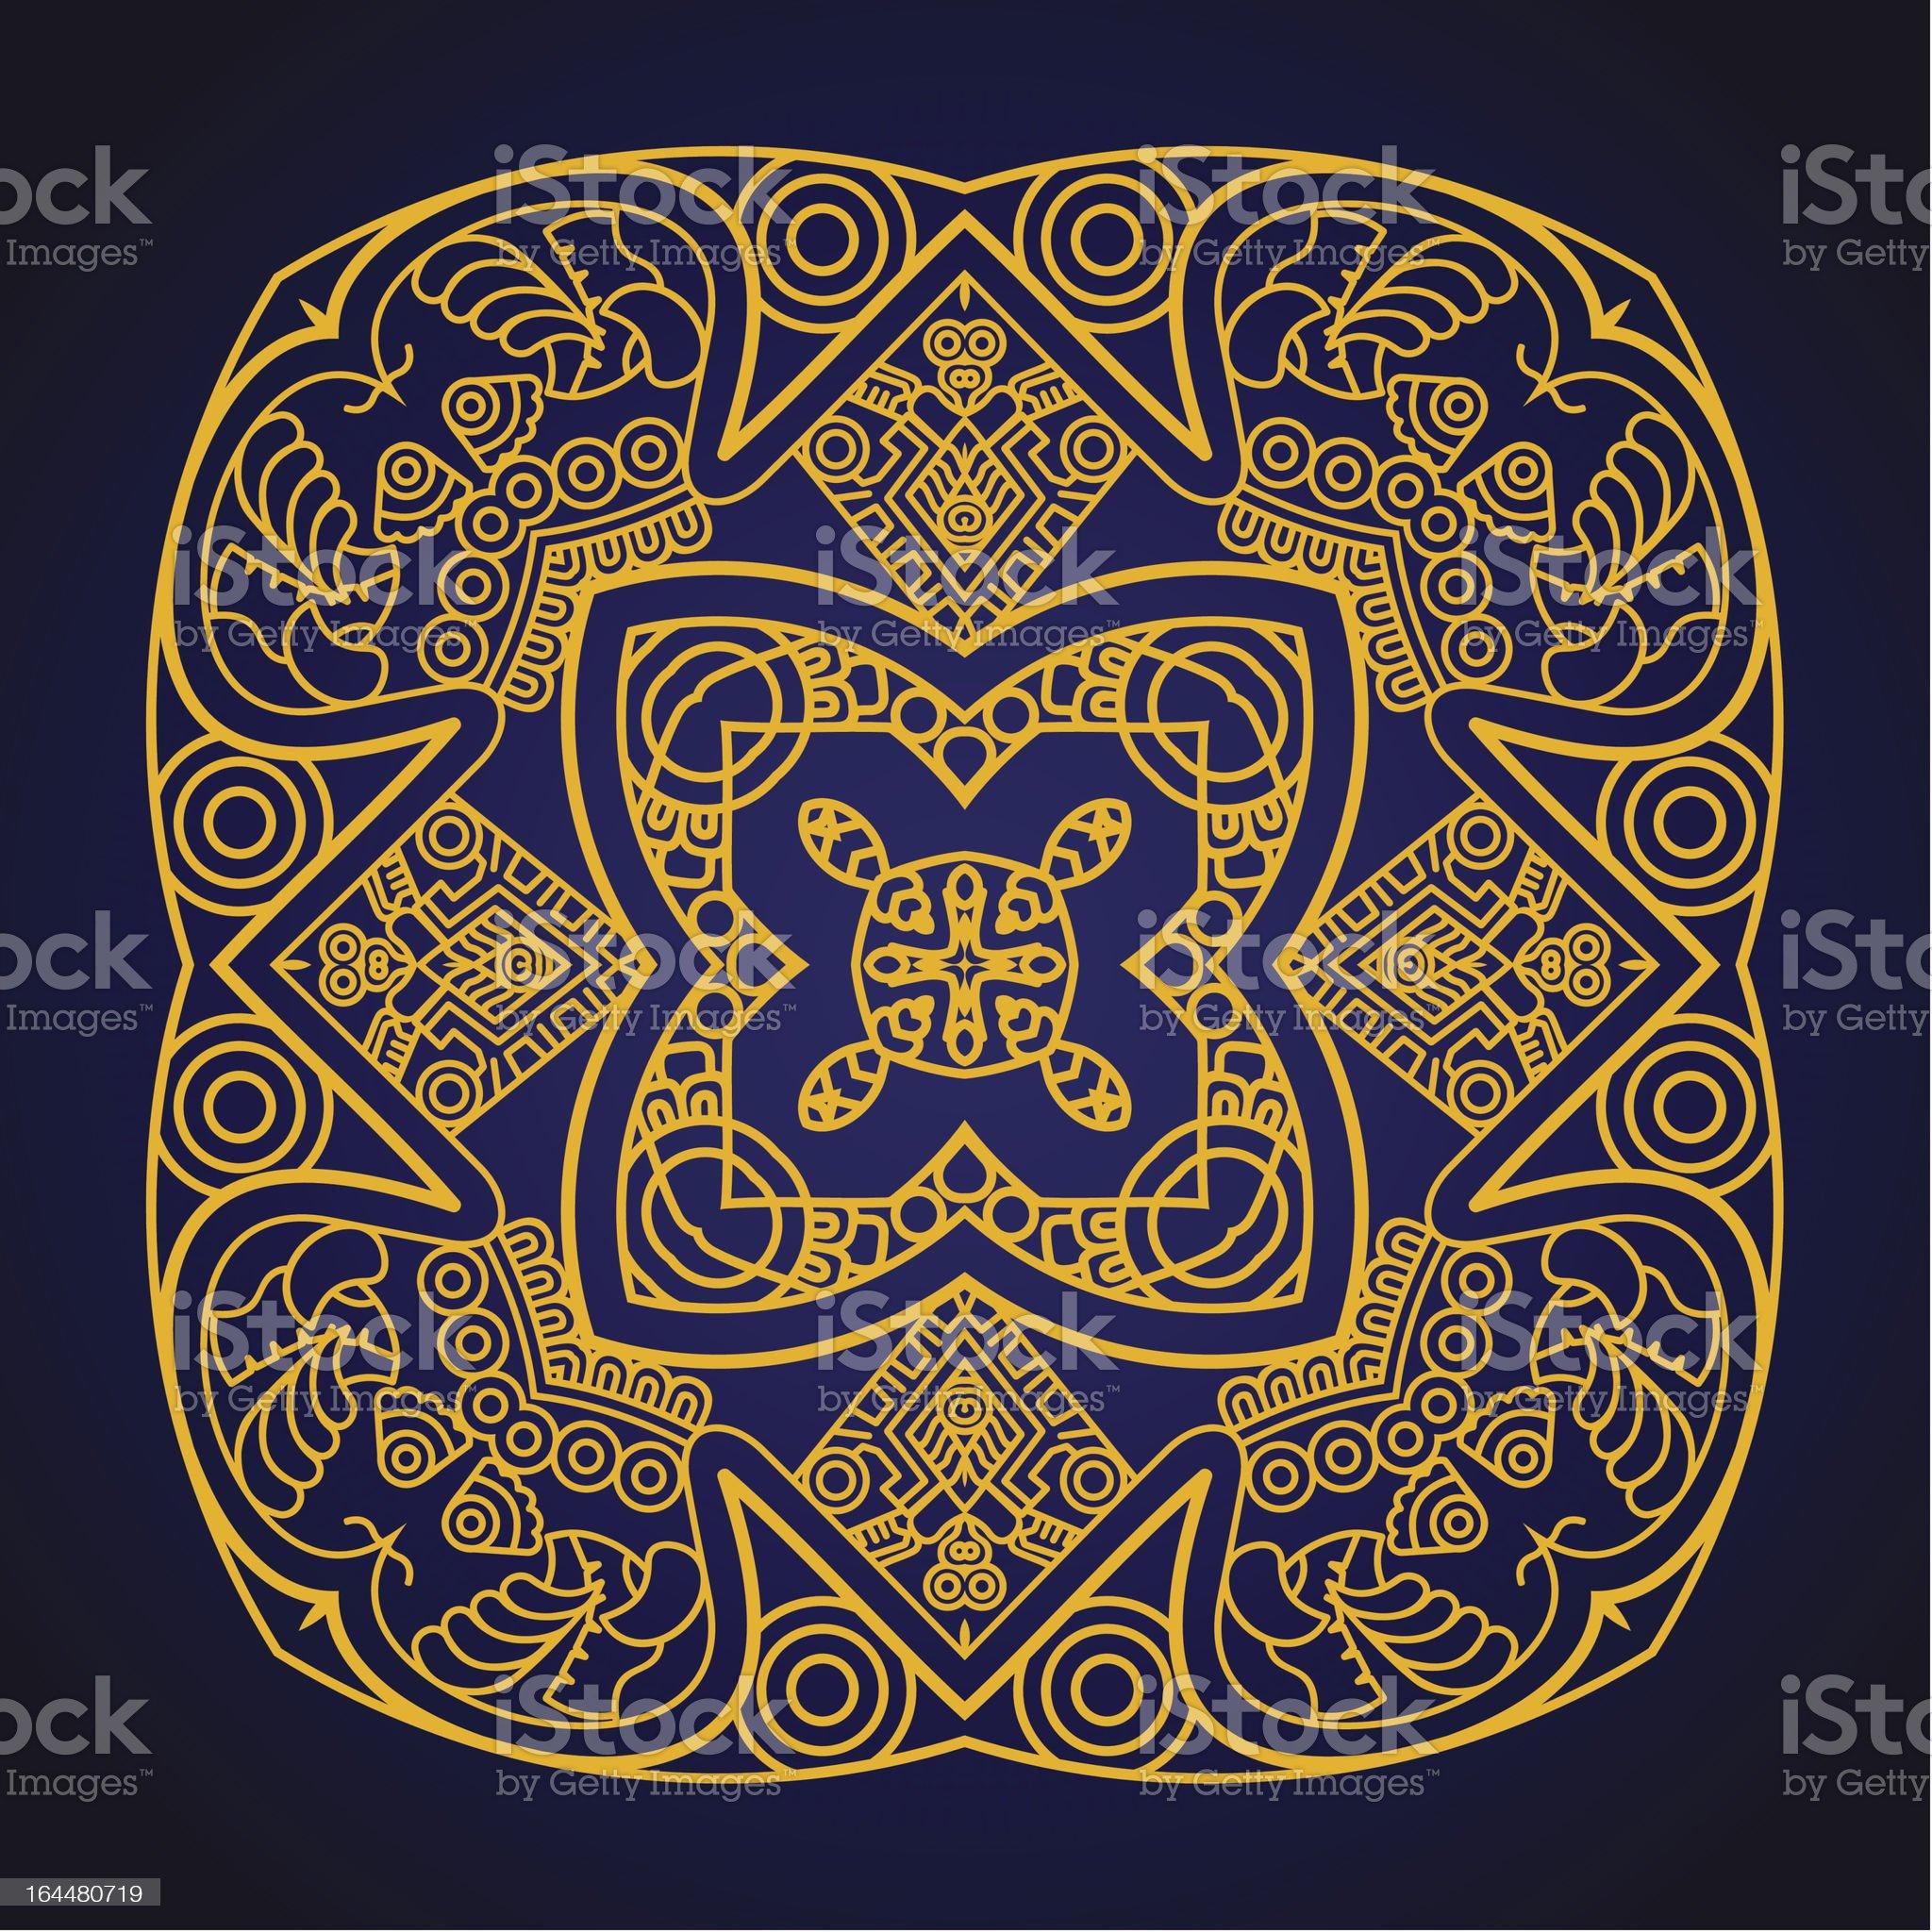 Vector square decorative design element royalty-free stock vector art